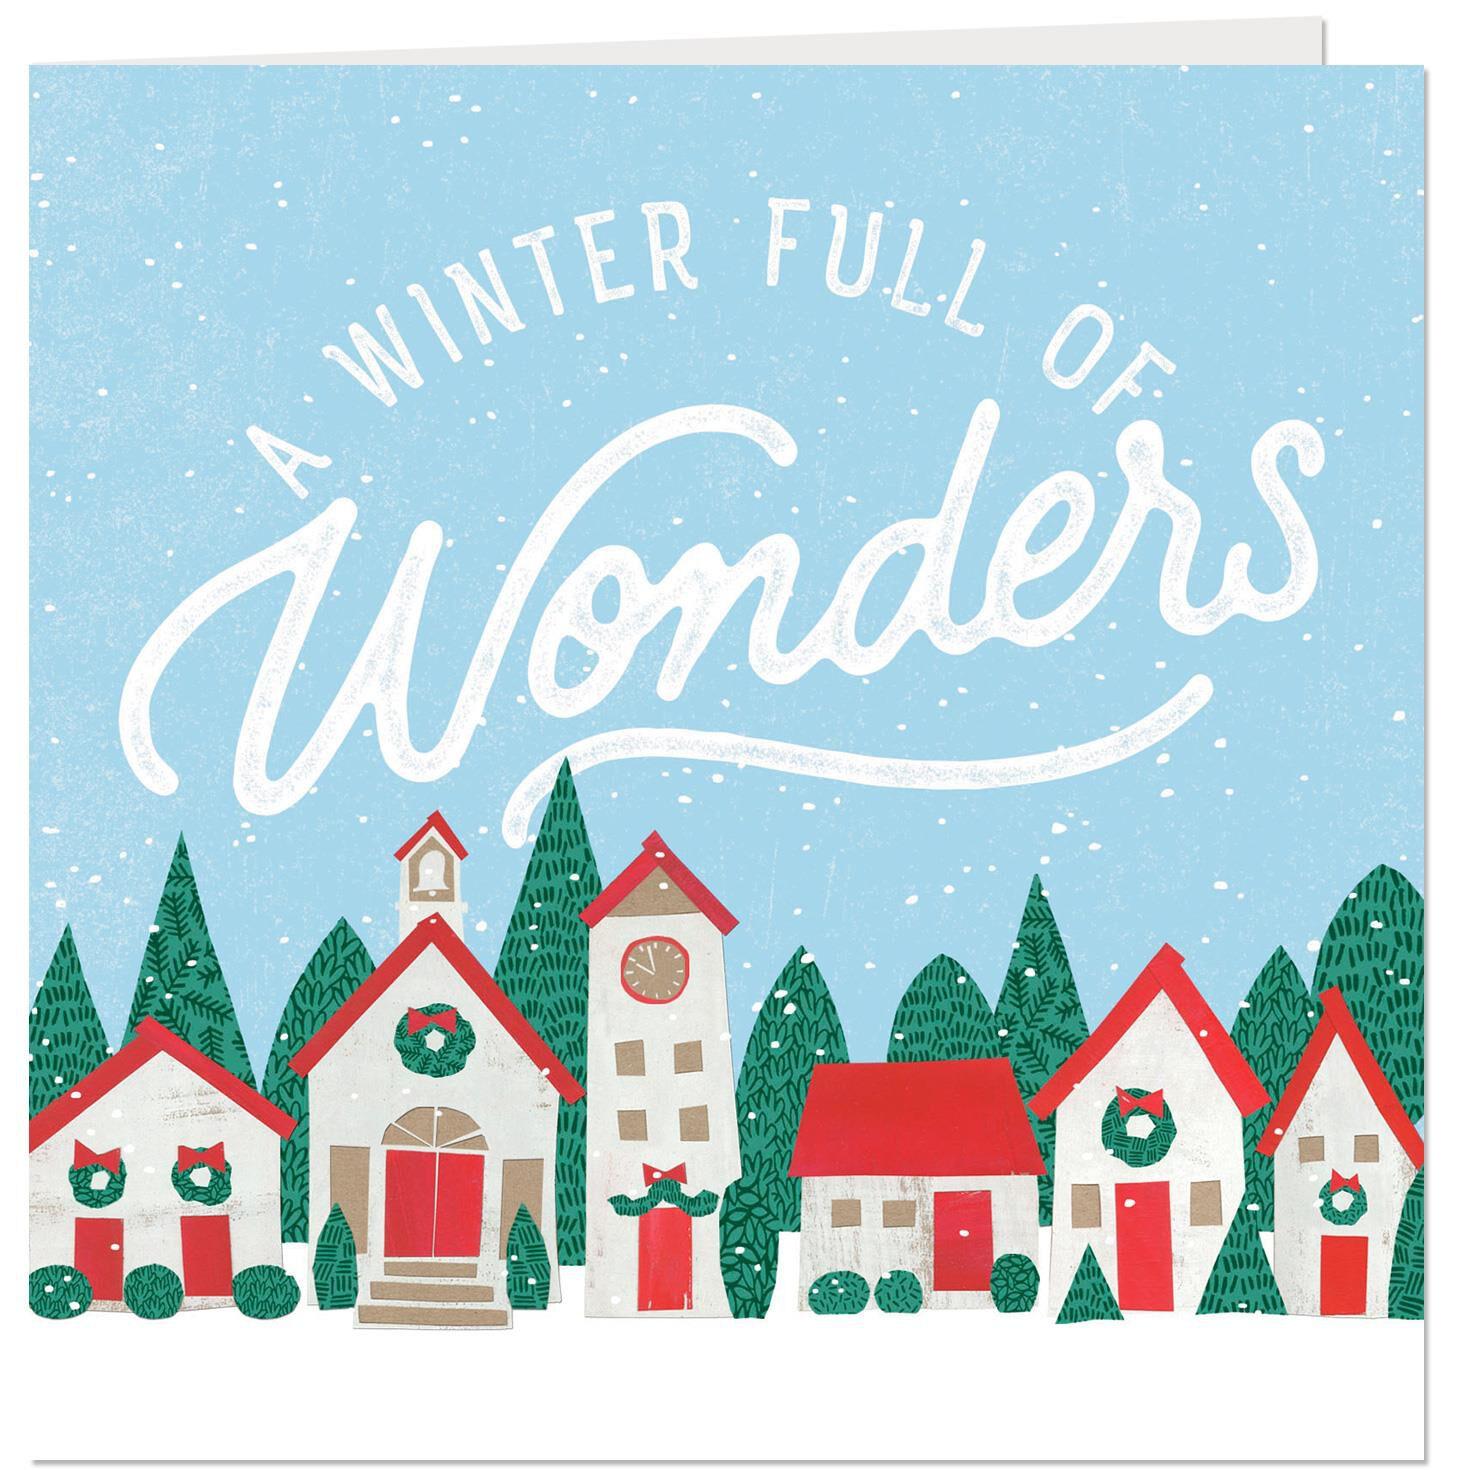 Winter Full of Wonders Musical Christmas Card Greeting Cards